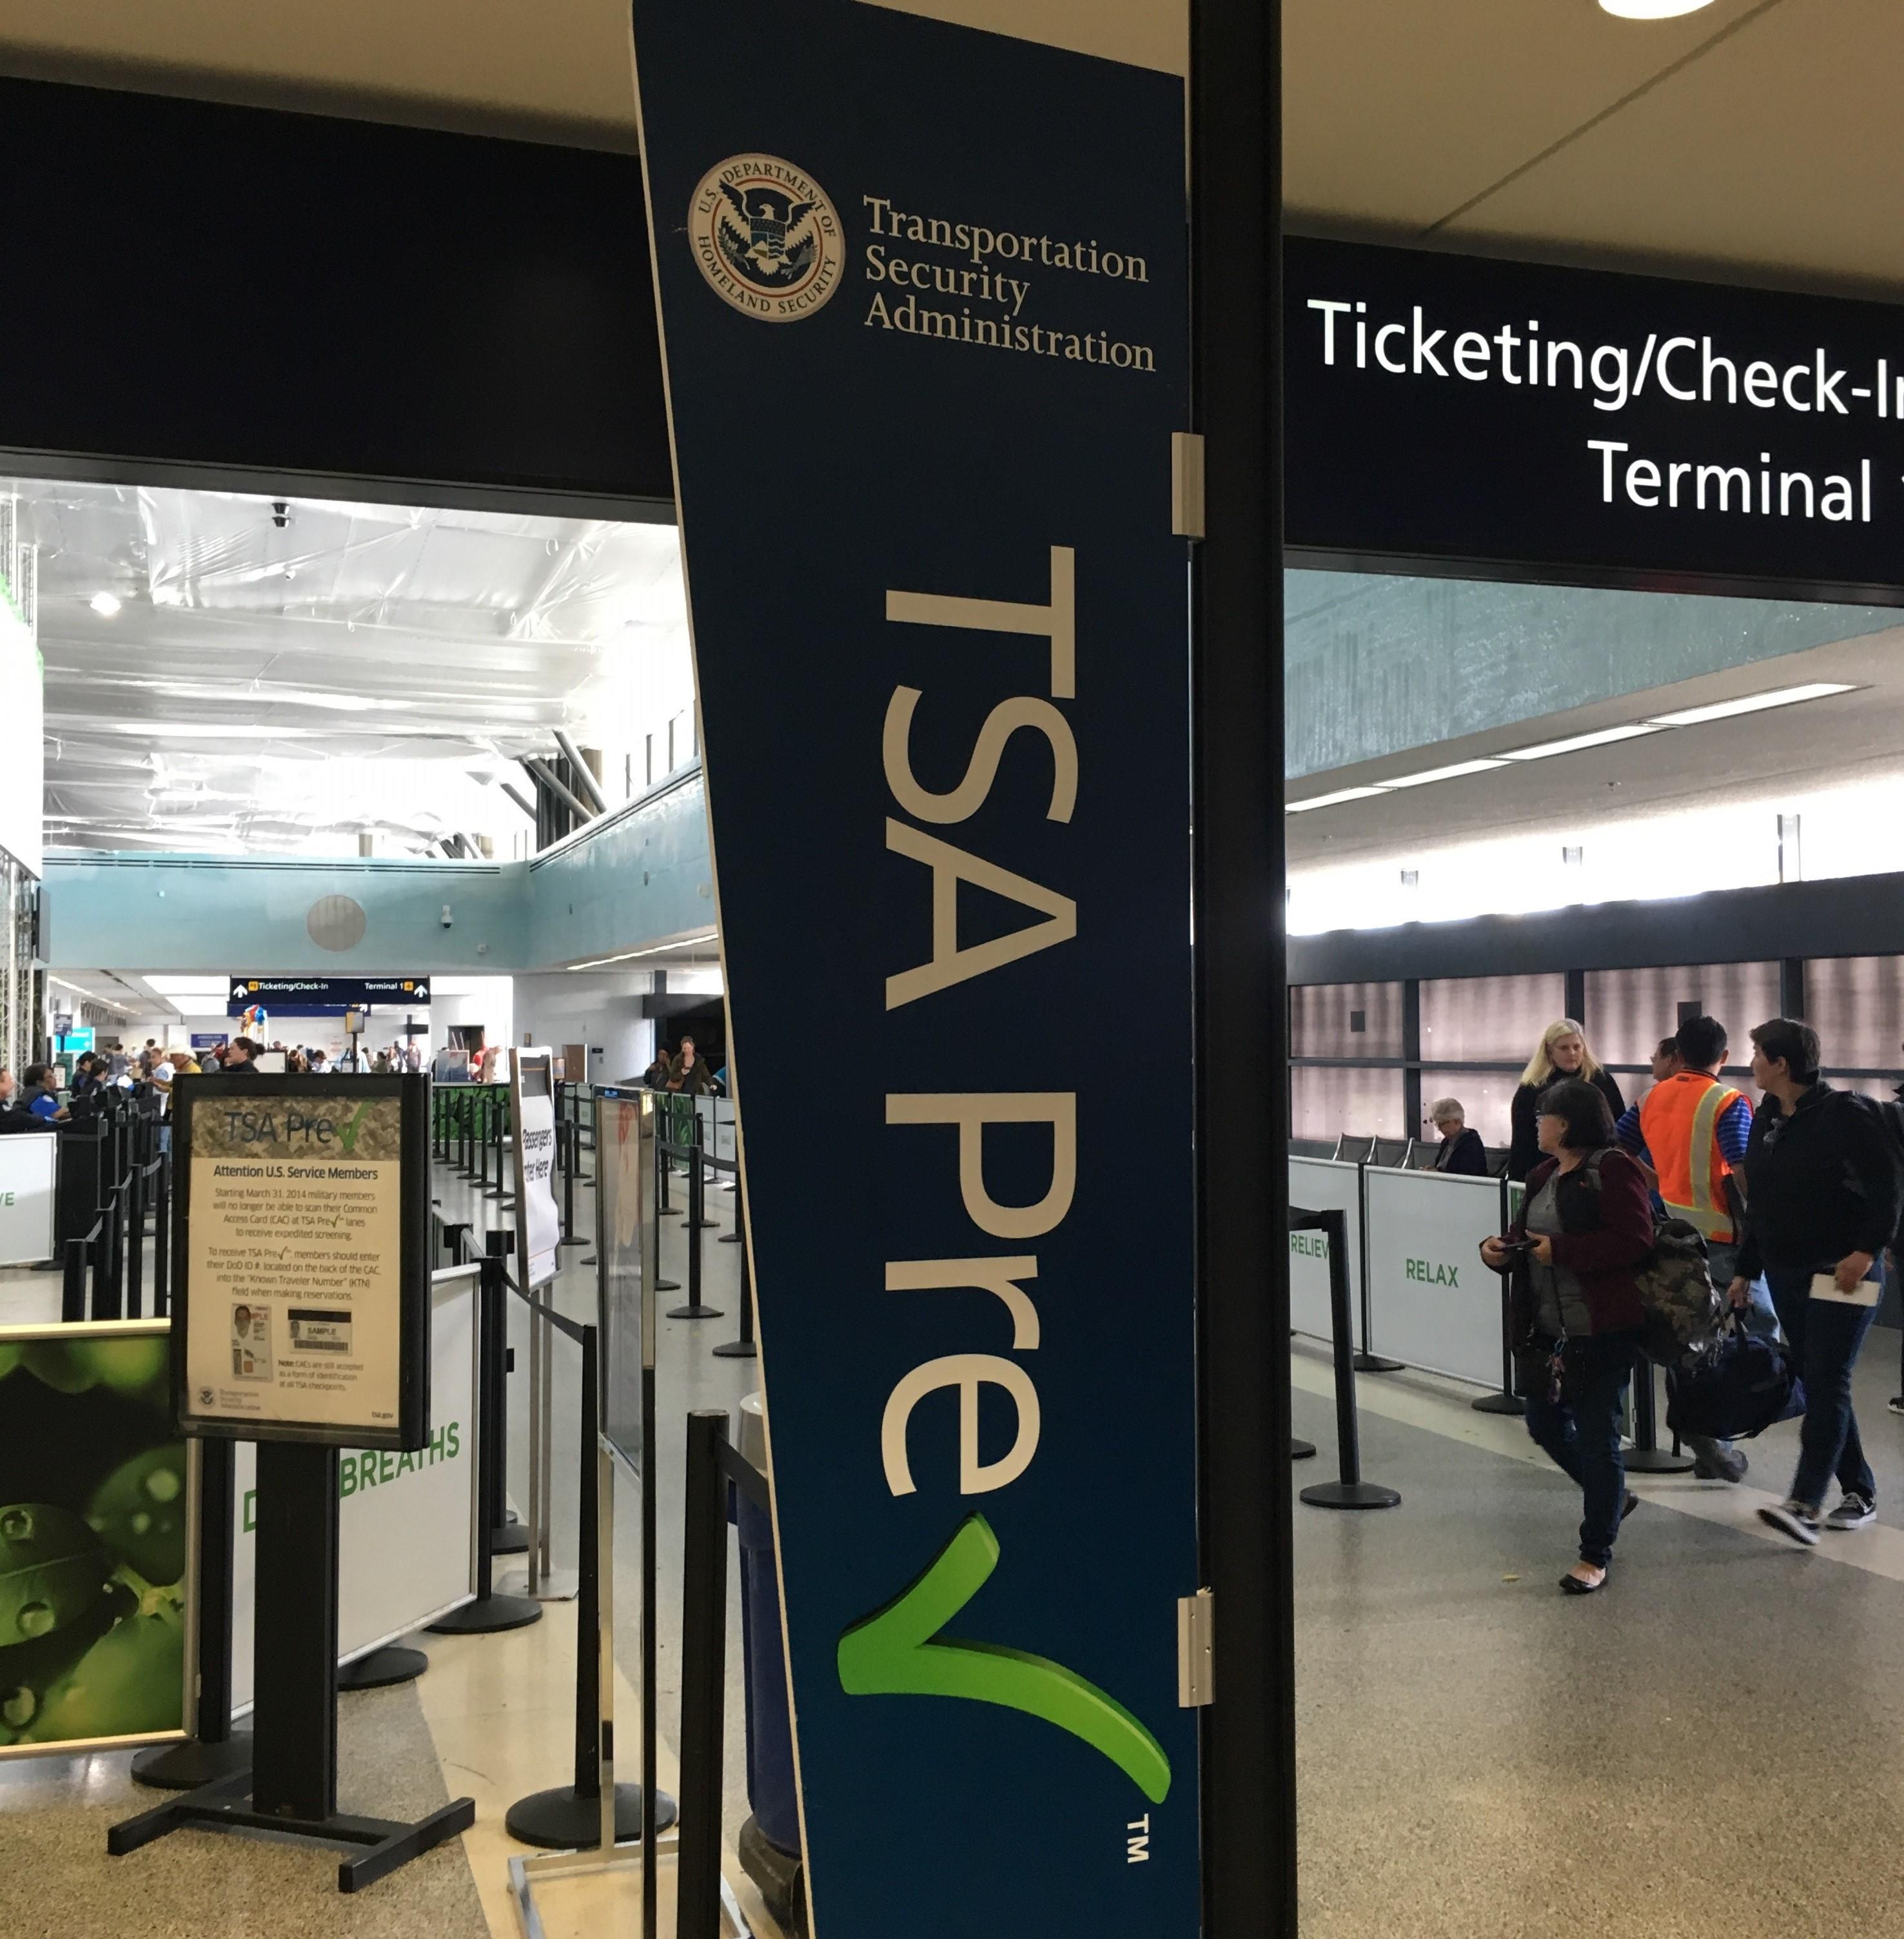 Tsa Pre Enrollment Offered For Two Weeks At Oakland International